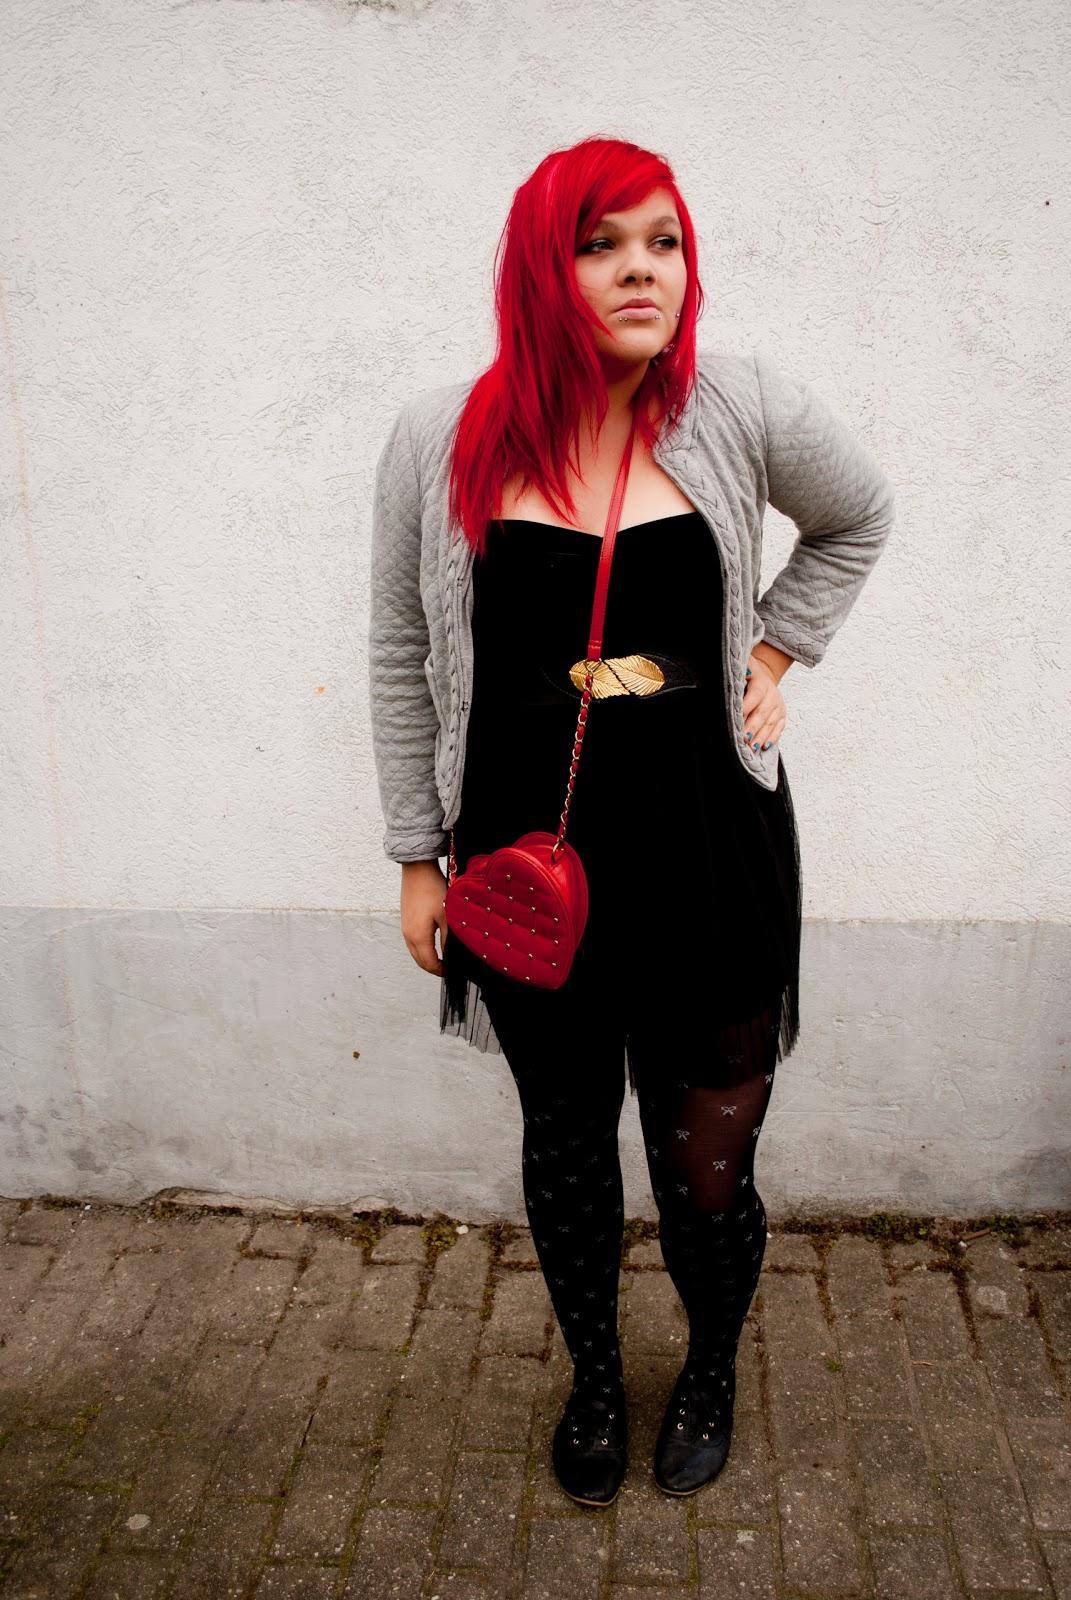 Black dress with red bag - Black Dress With Red Bag 6